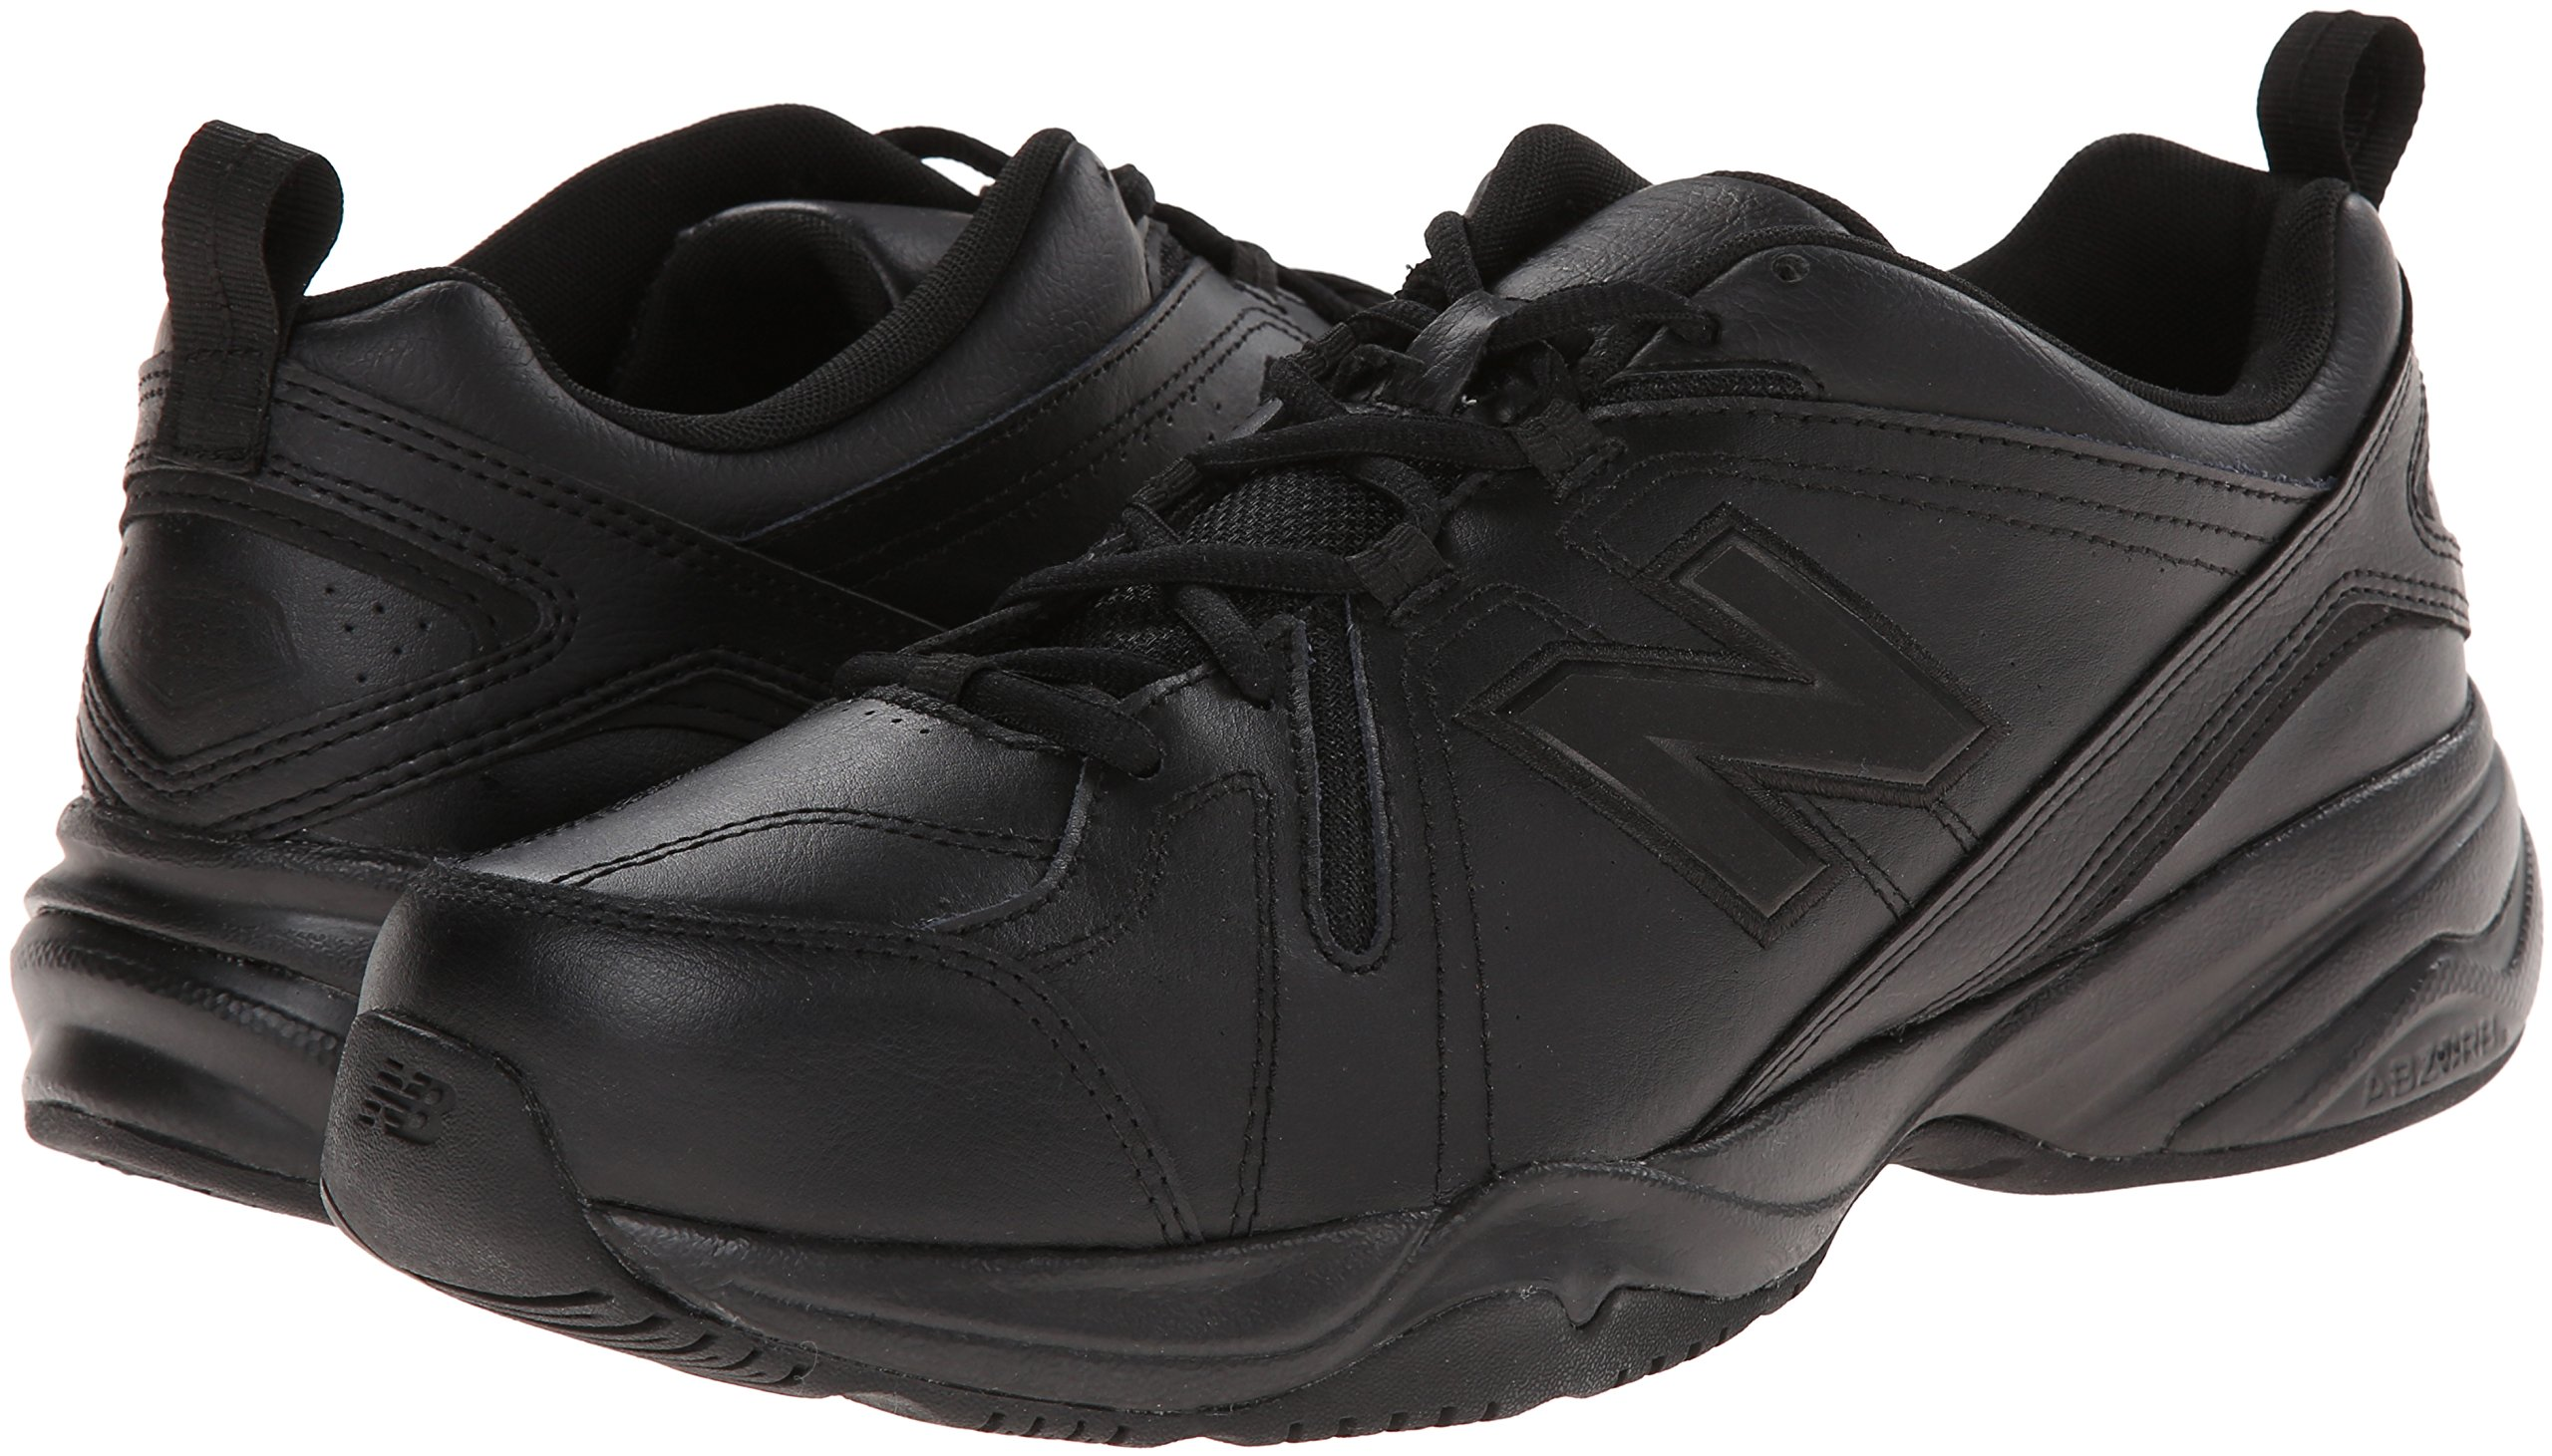 New Balance Men's MX608v4 Training Shoe, Black, 6.5 D US by New Balance (Image #6)